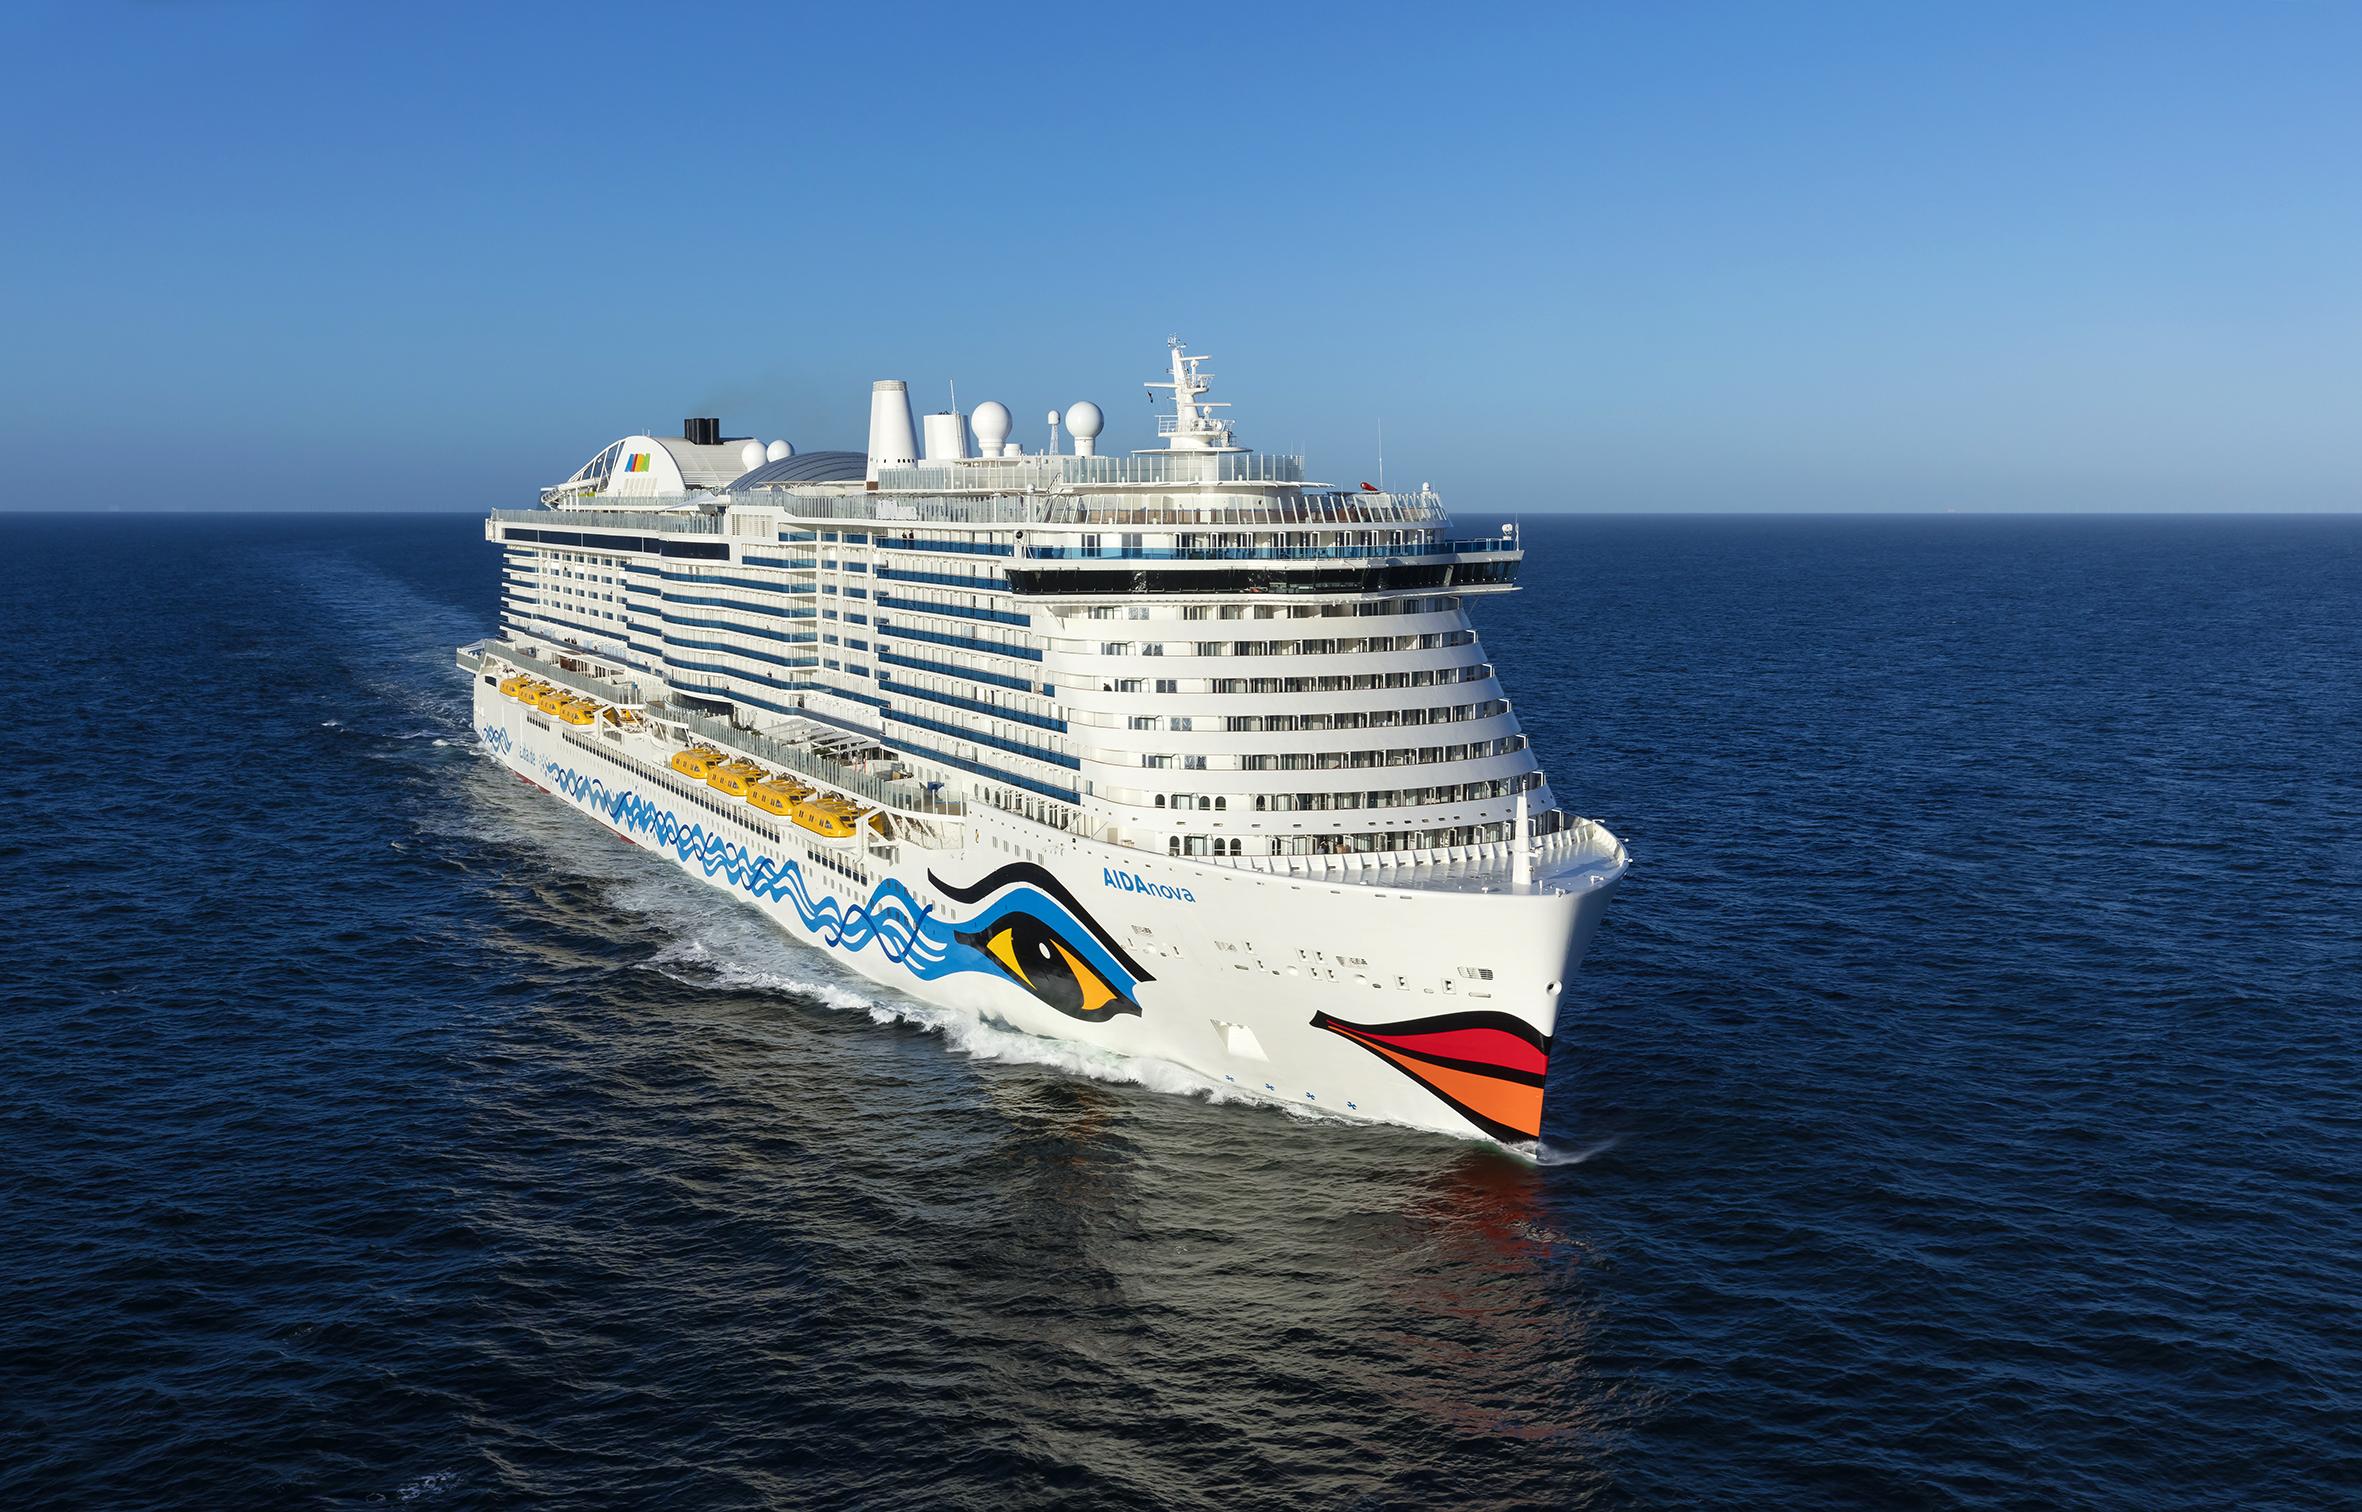 AIDANova, the world's first fully LNG-powered cruise ship